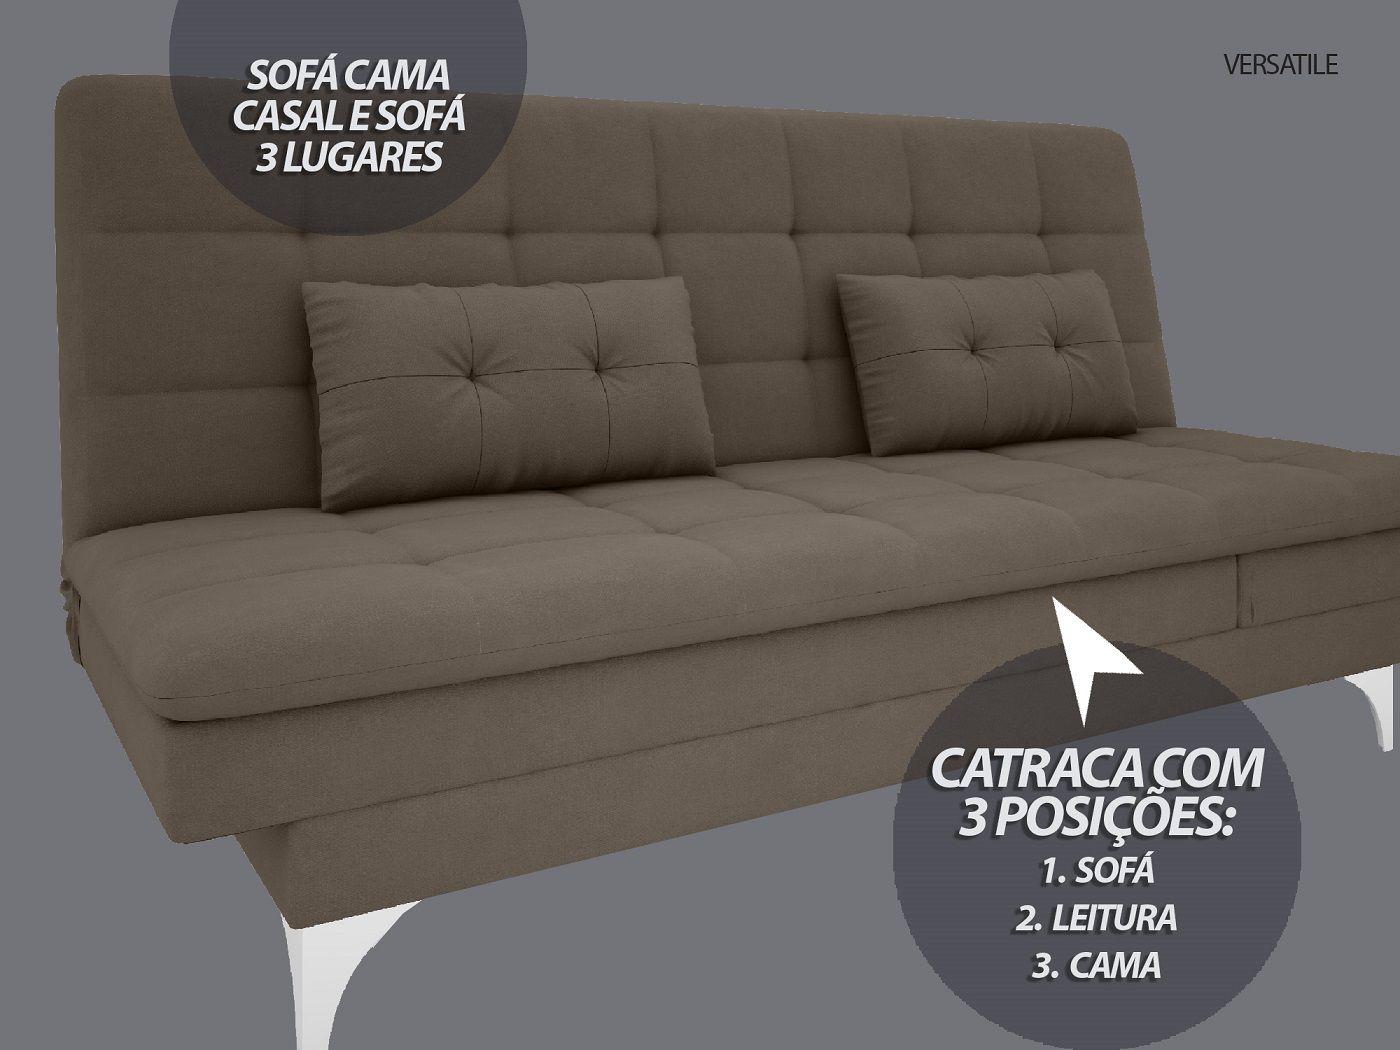 Sofá-Cama Casal New Versatile 1,94m Velosuede Marrom - NETSOFAS  - NETSOFÁS